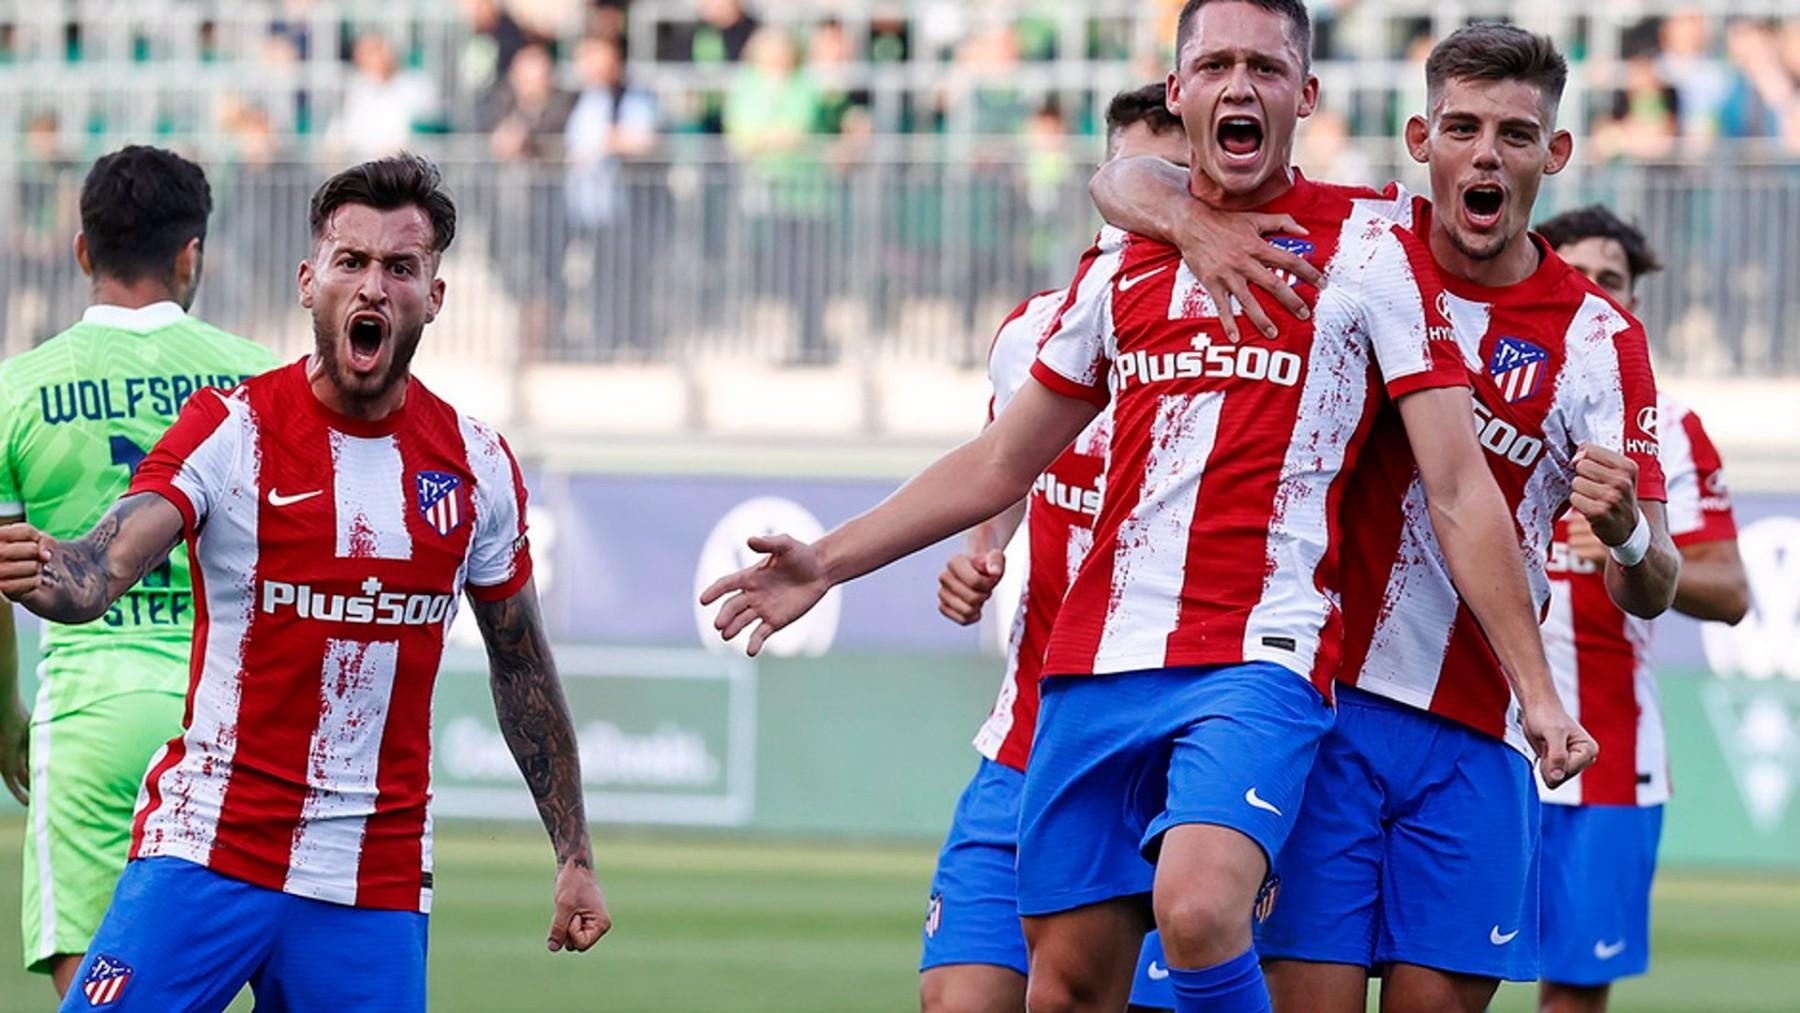 El Atlético de Madrid celebra un gol. (Europapress)